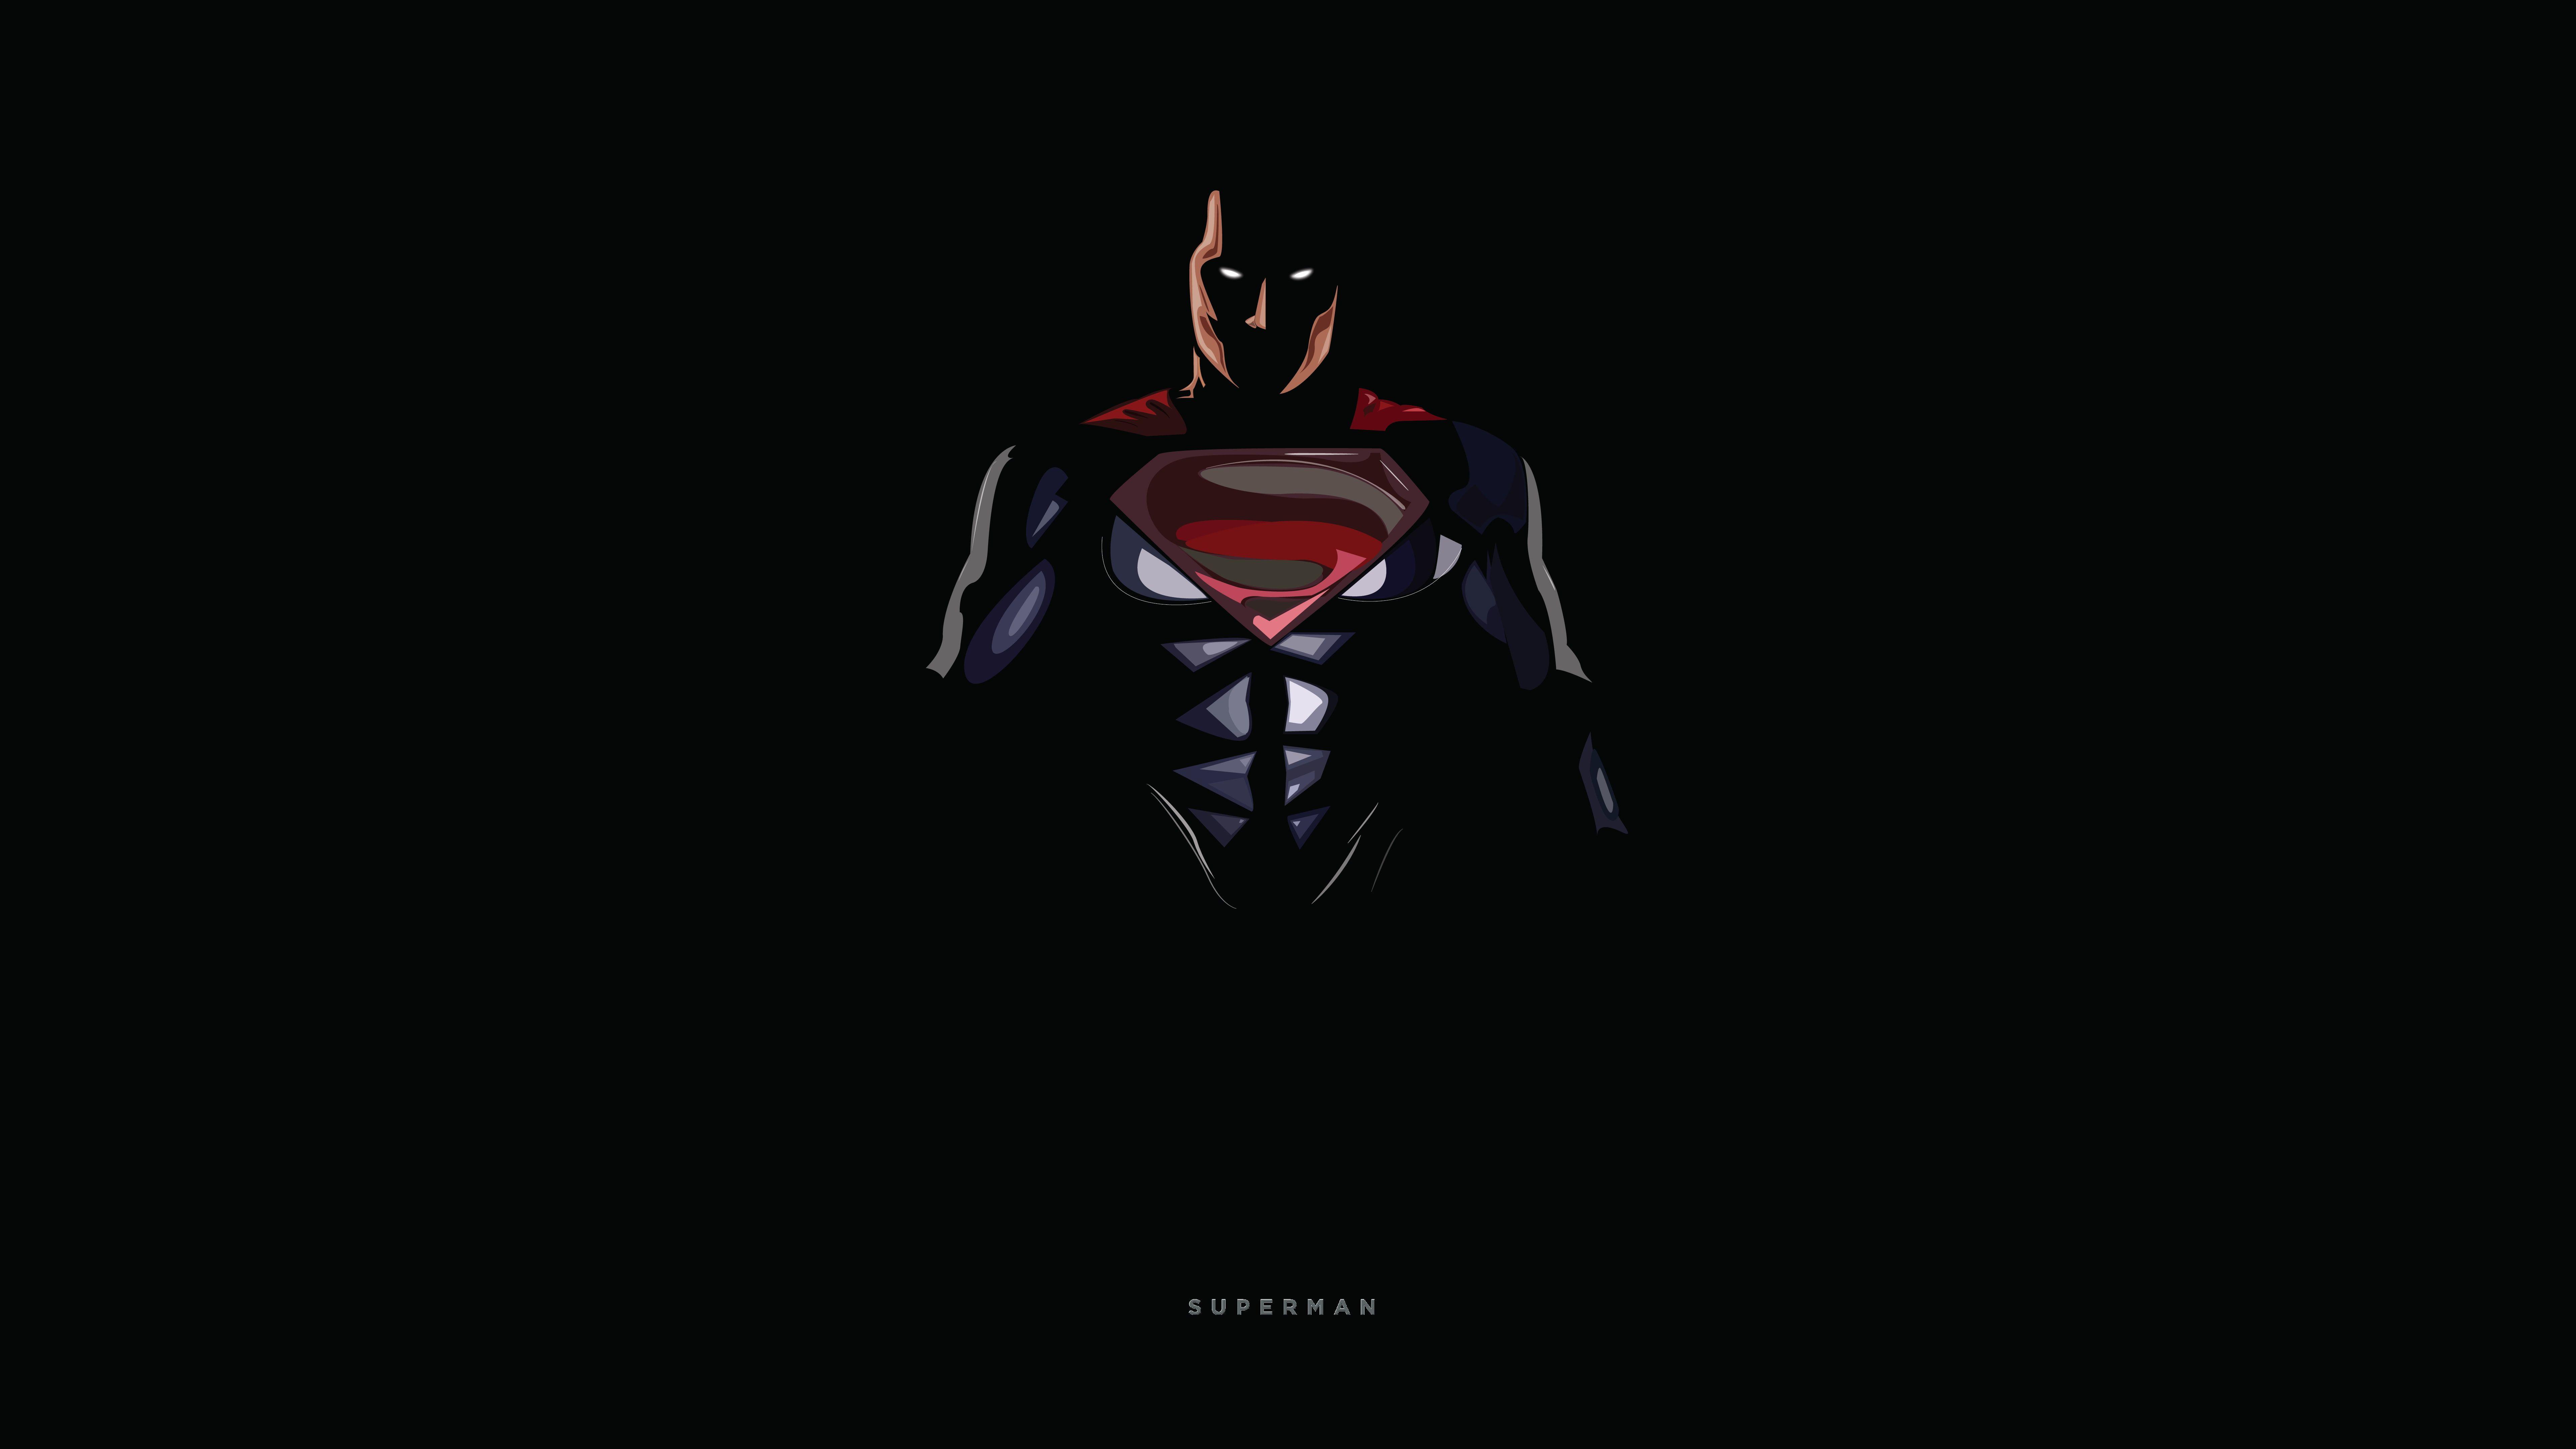 Superheroes DC Comics 8K Dark background Minimal